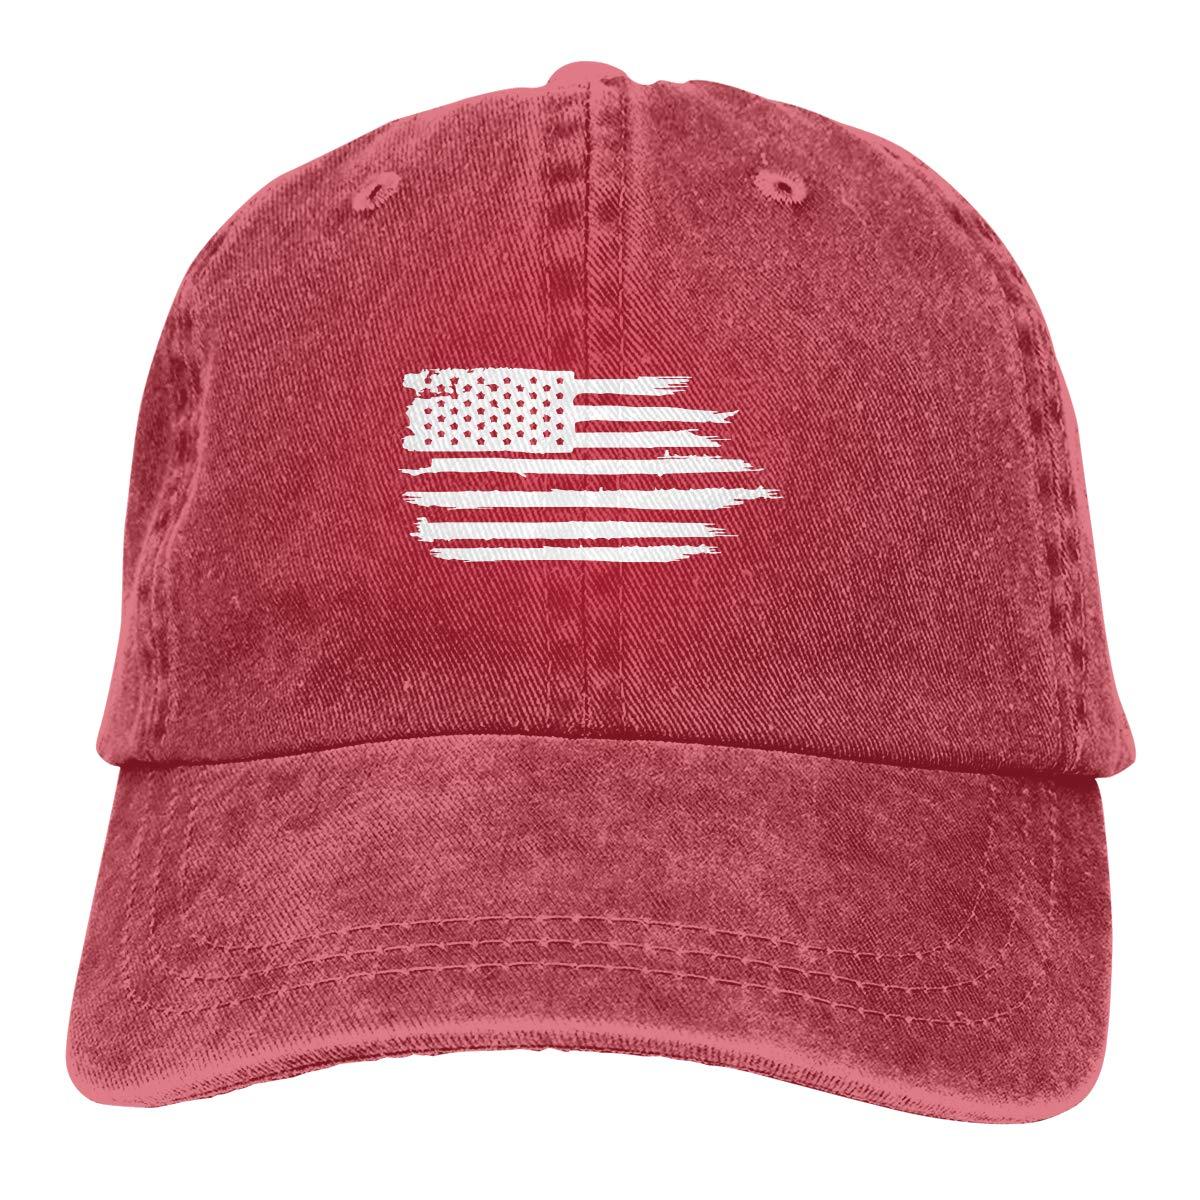 Sajfirlug Distressed White USA Flag Fashion Adjustable Cowboy Cap Baseball Cap for Women and Men